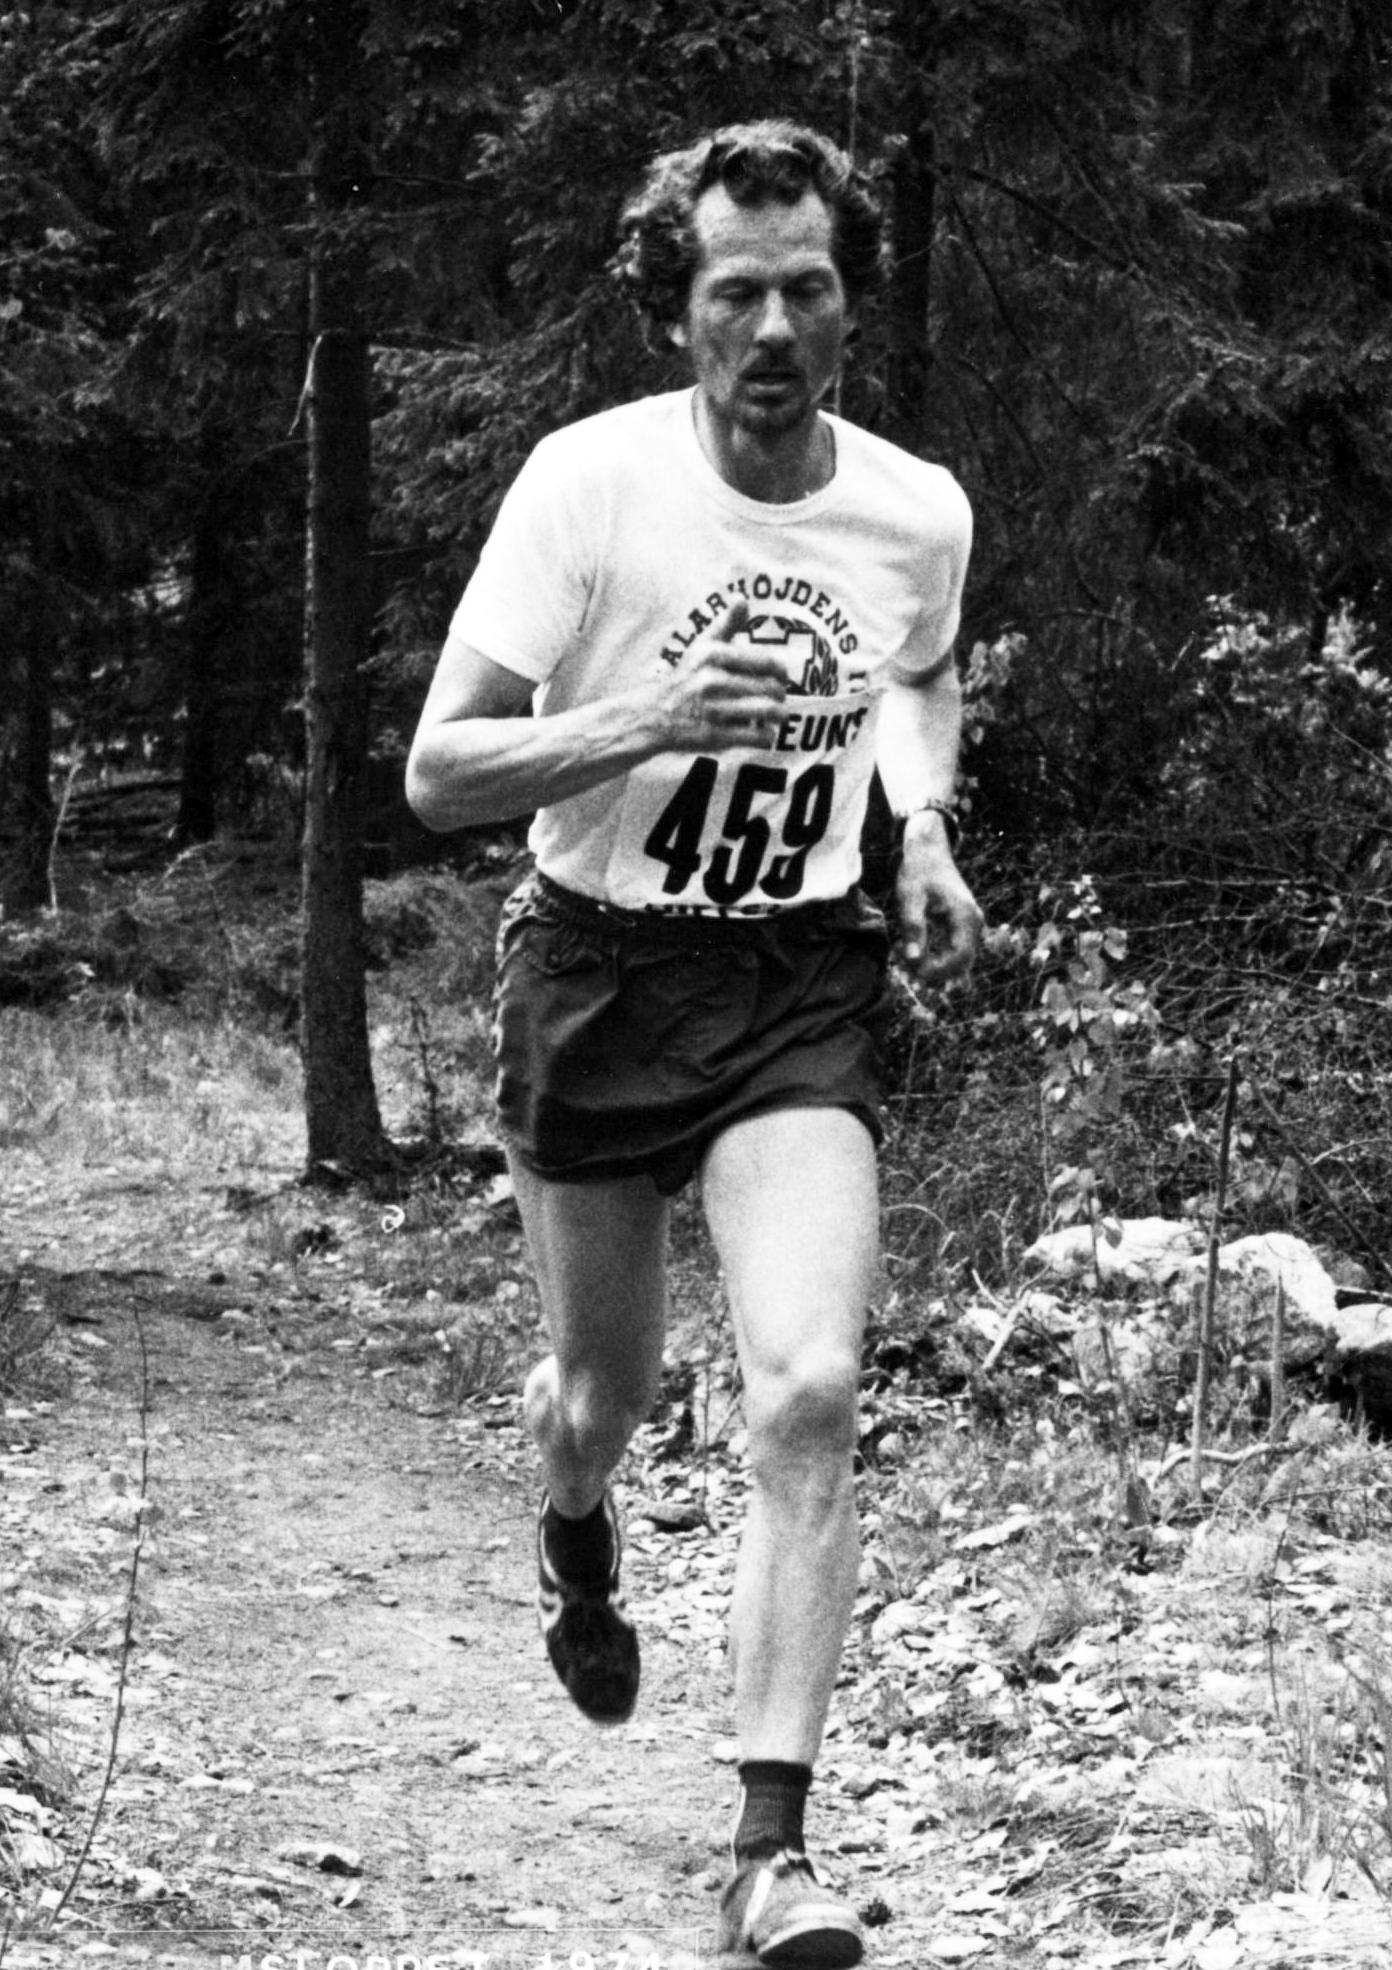 Nisse 1974